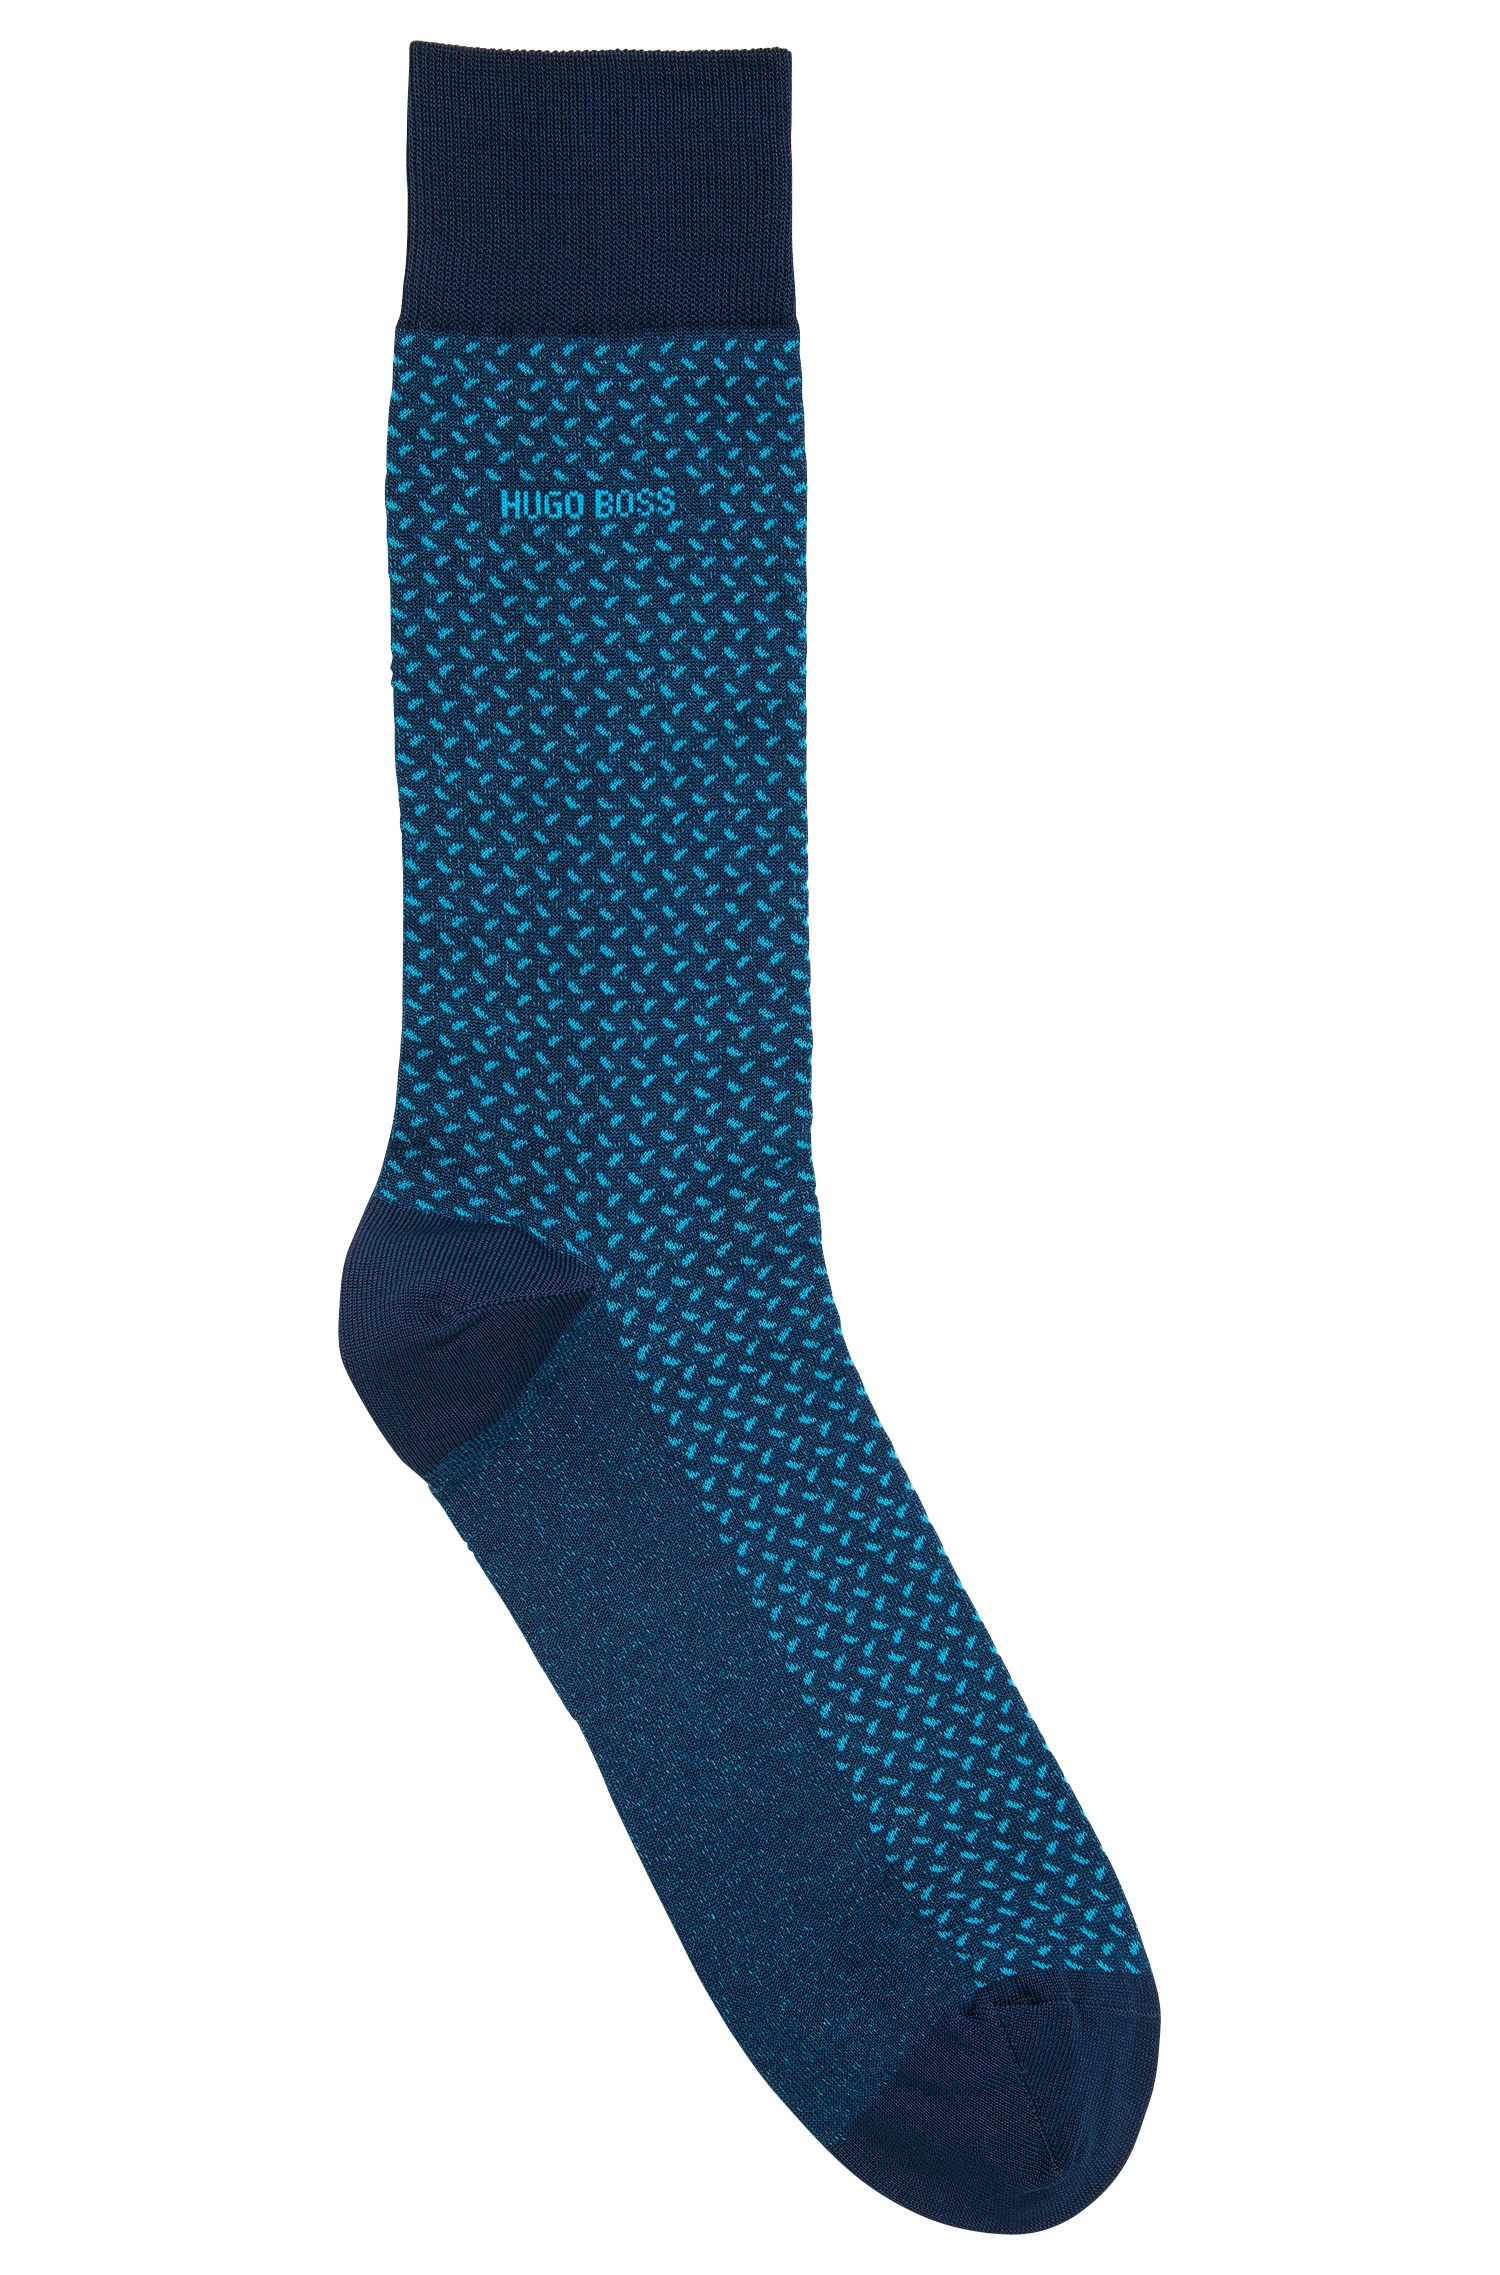 Patterned Cotton Blend Sock | RS MiniPattern US MC